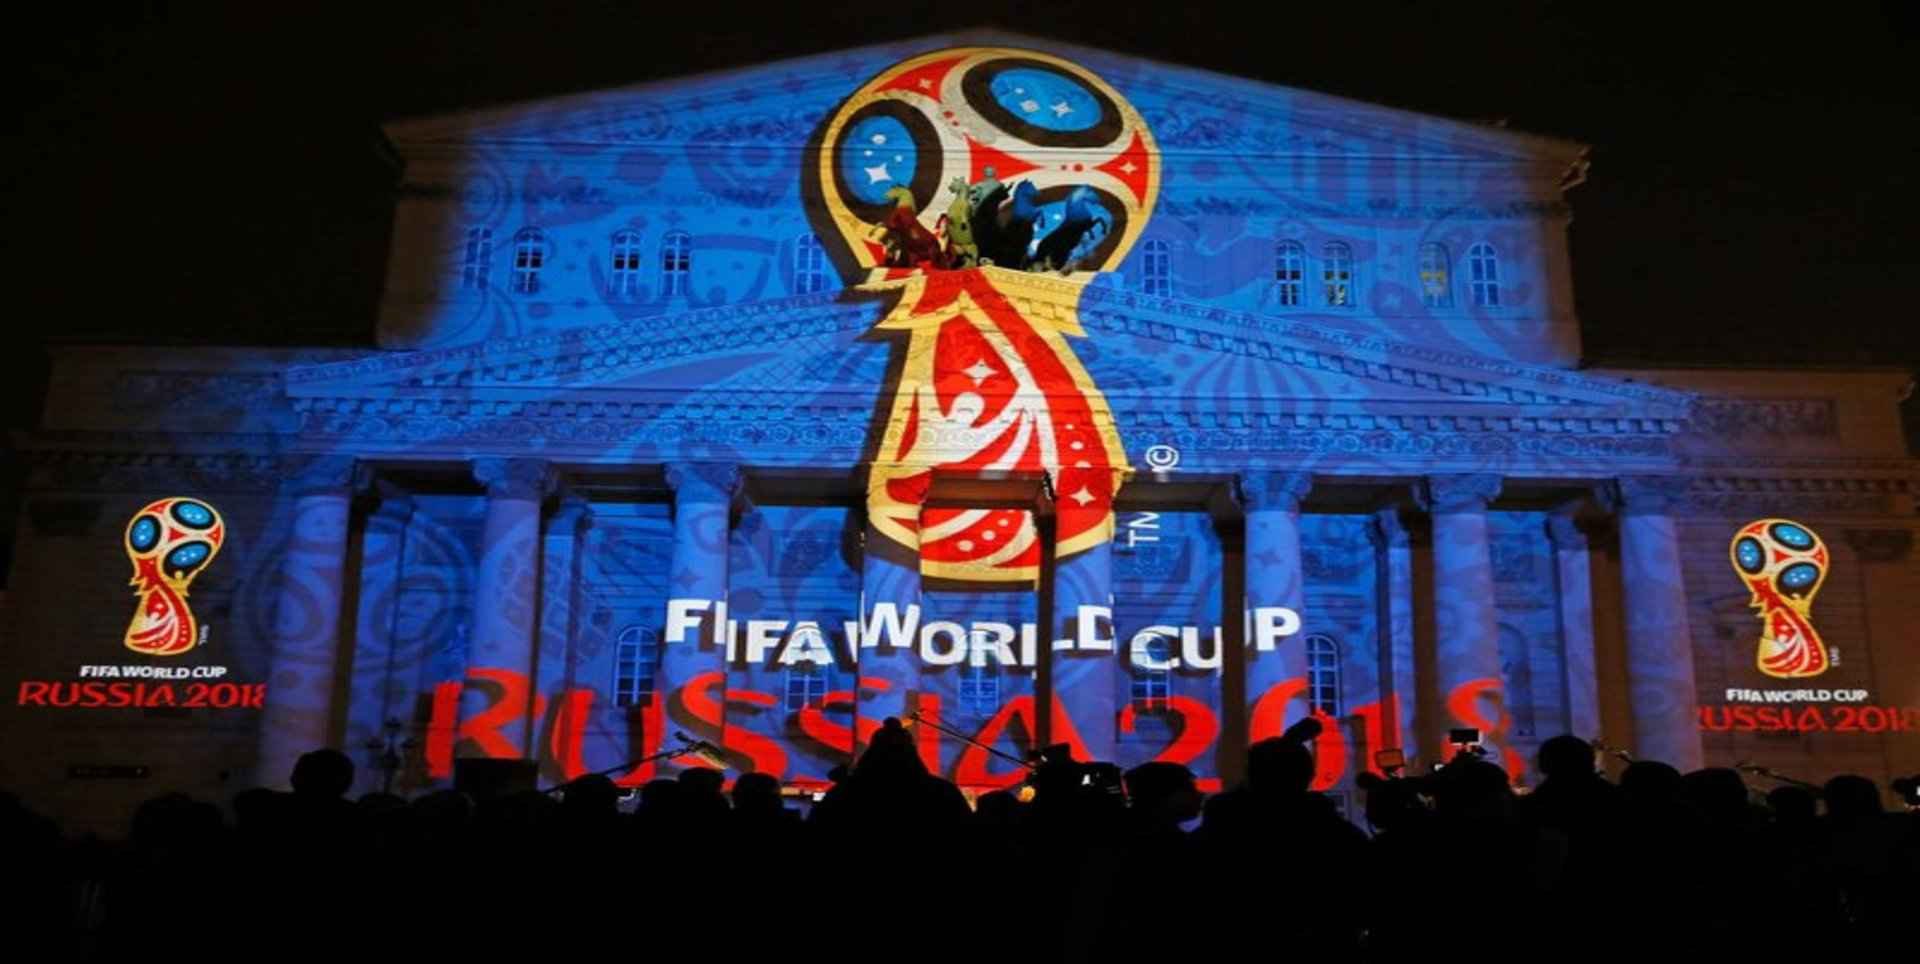 FIFA WC Burkina Faso V Senegal Live